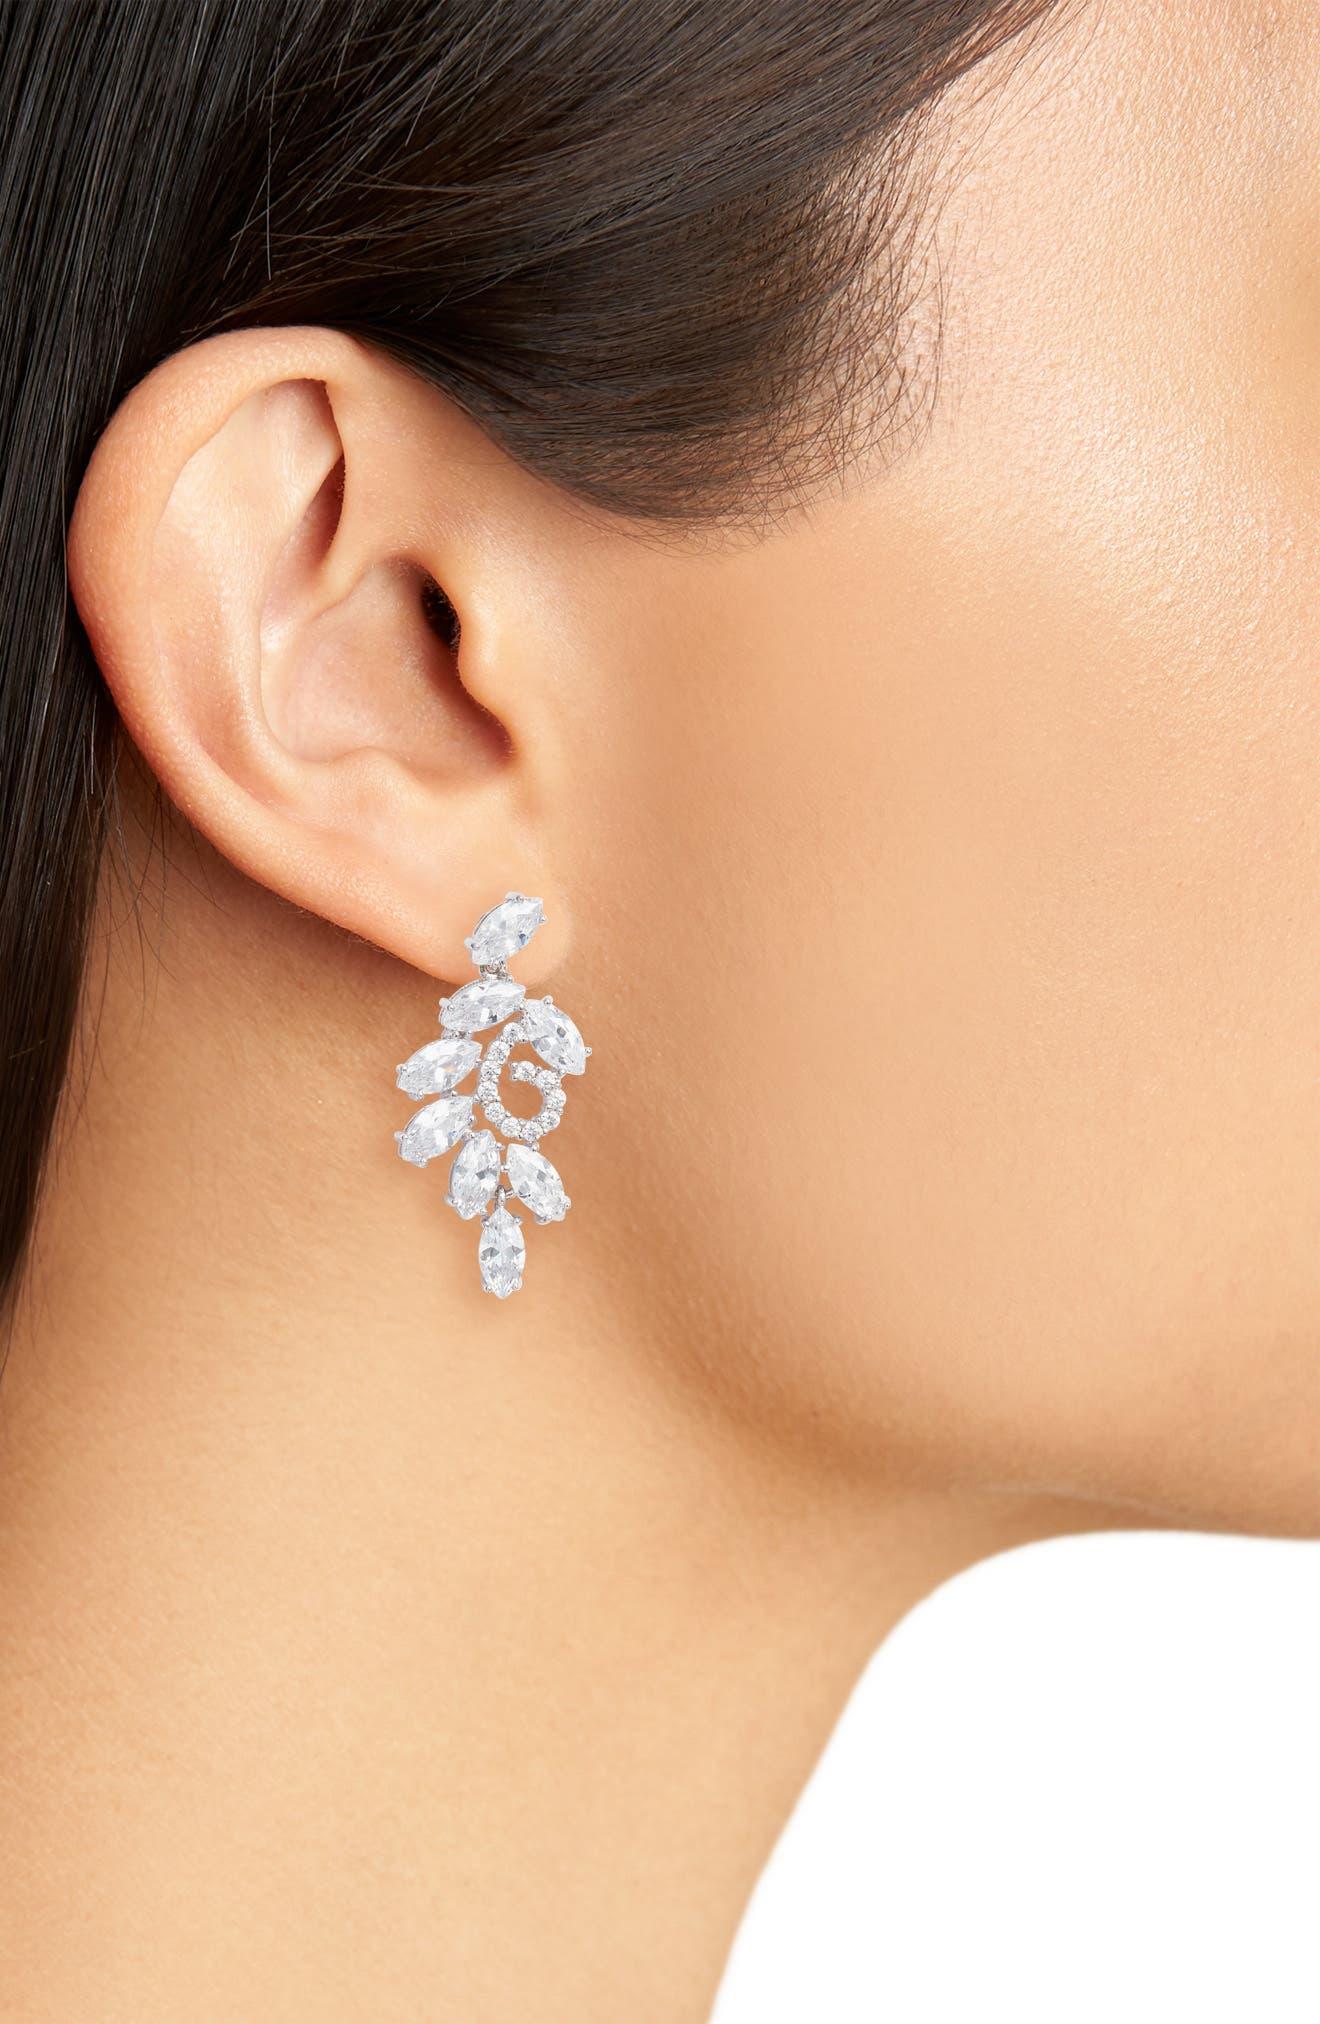 Cluster Branch Stud Earrings,                             Alternate thumbnail 2, color,                             Silver/ White Cz